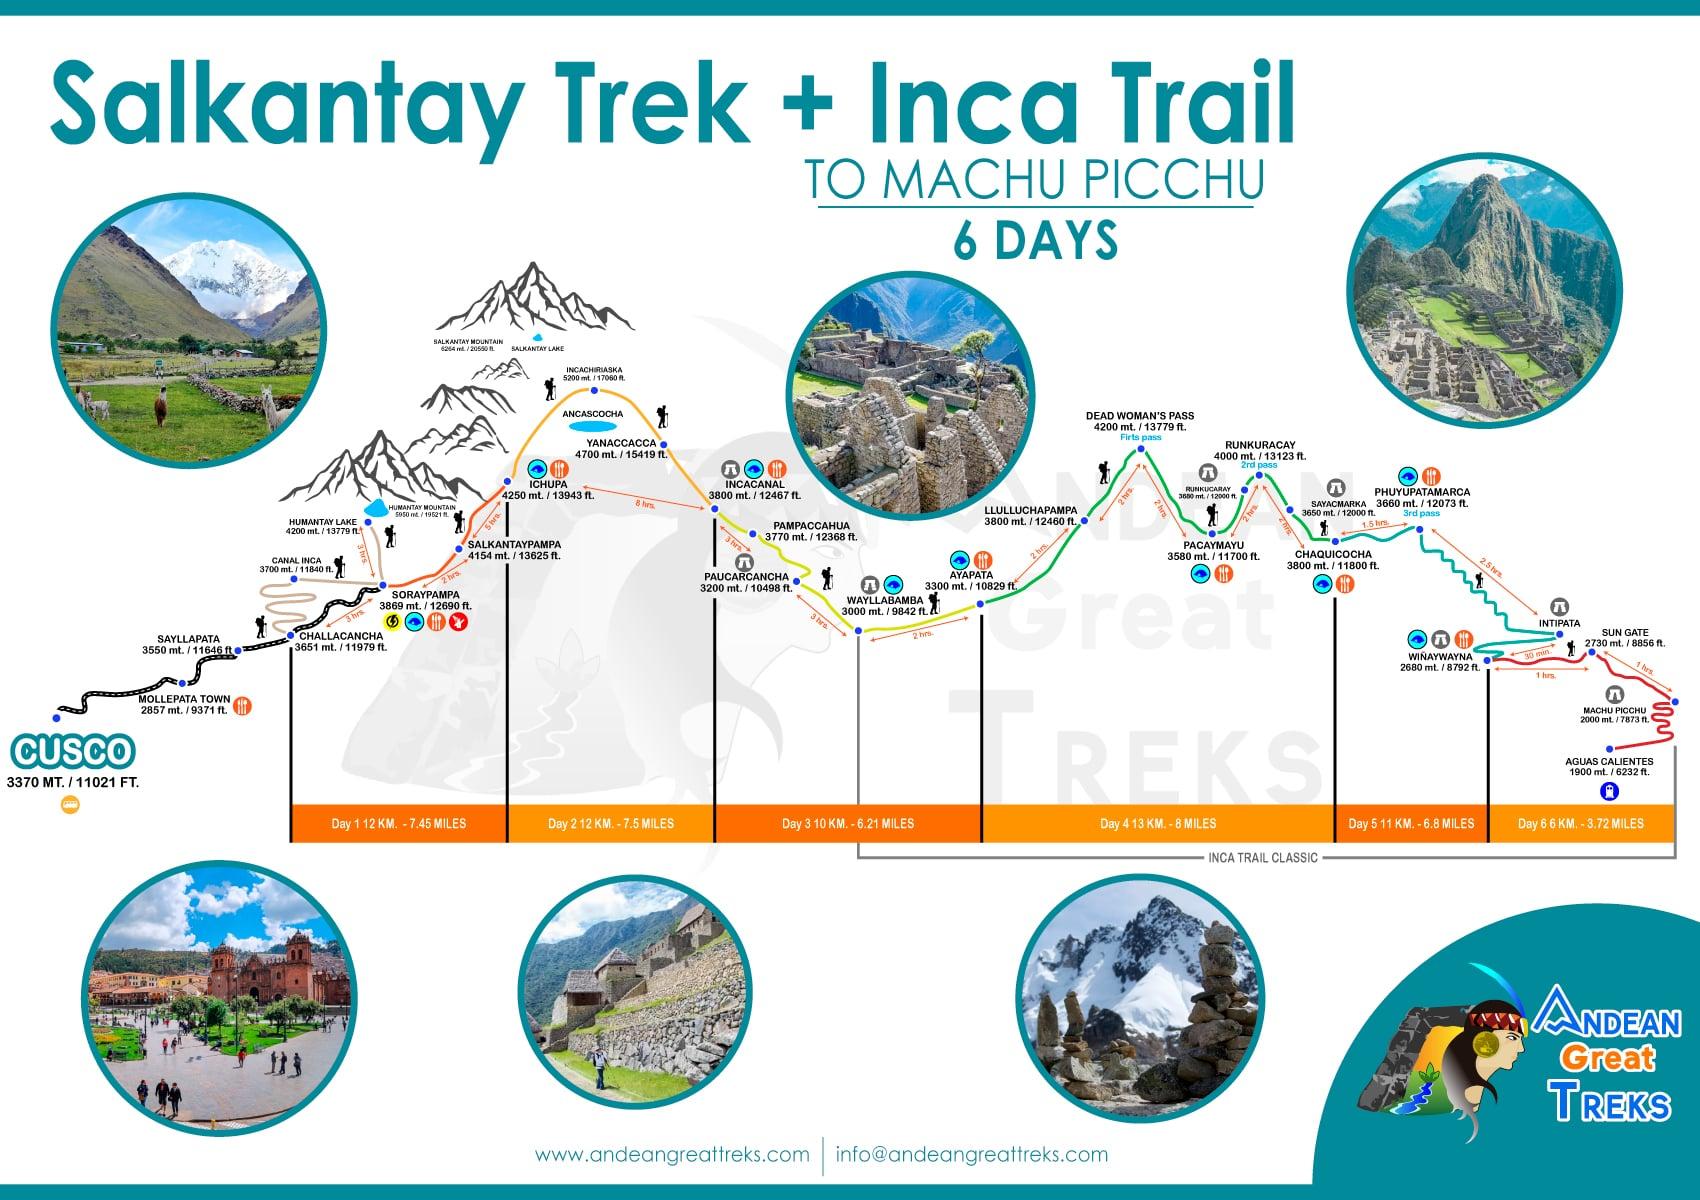 Salkantay Trek to Machu Picchu by Eco Path Trek